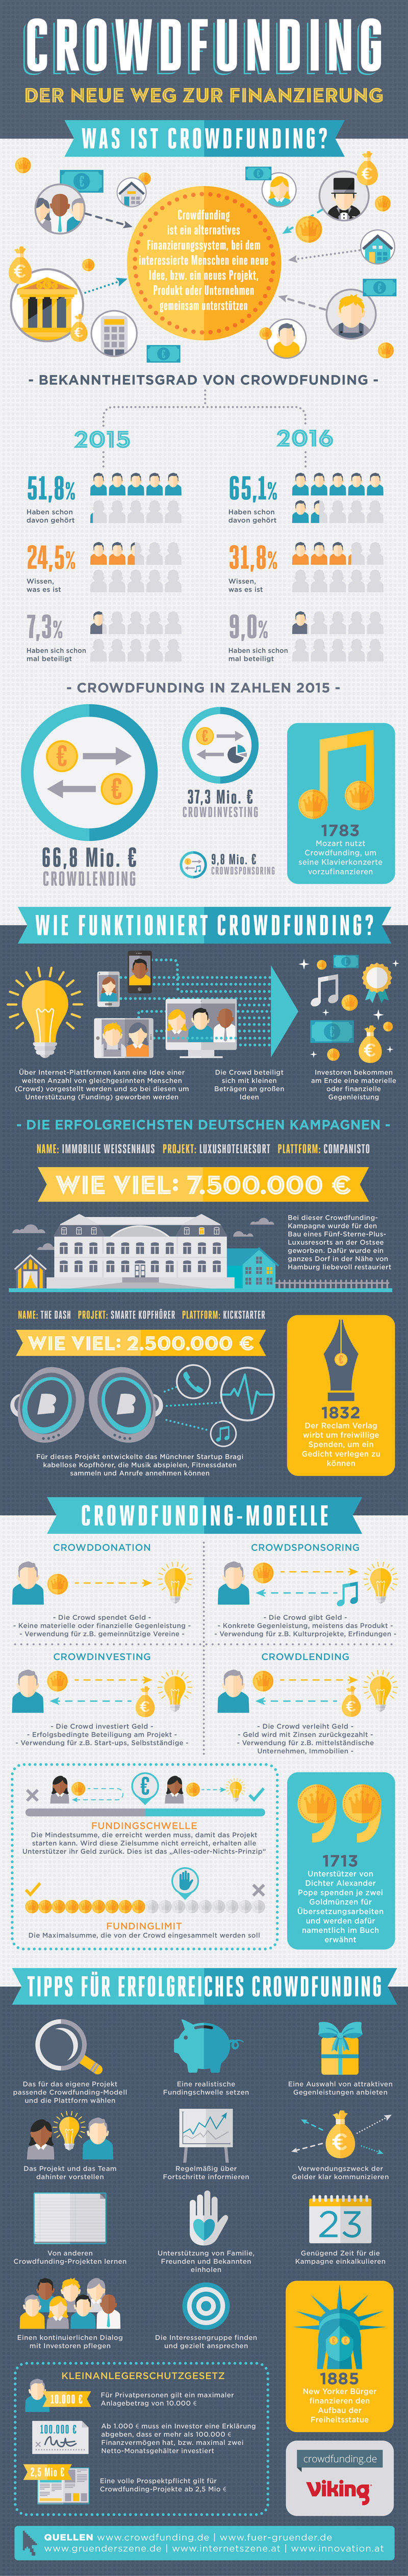 Crowdfunding German Stg_3